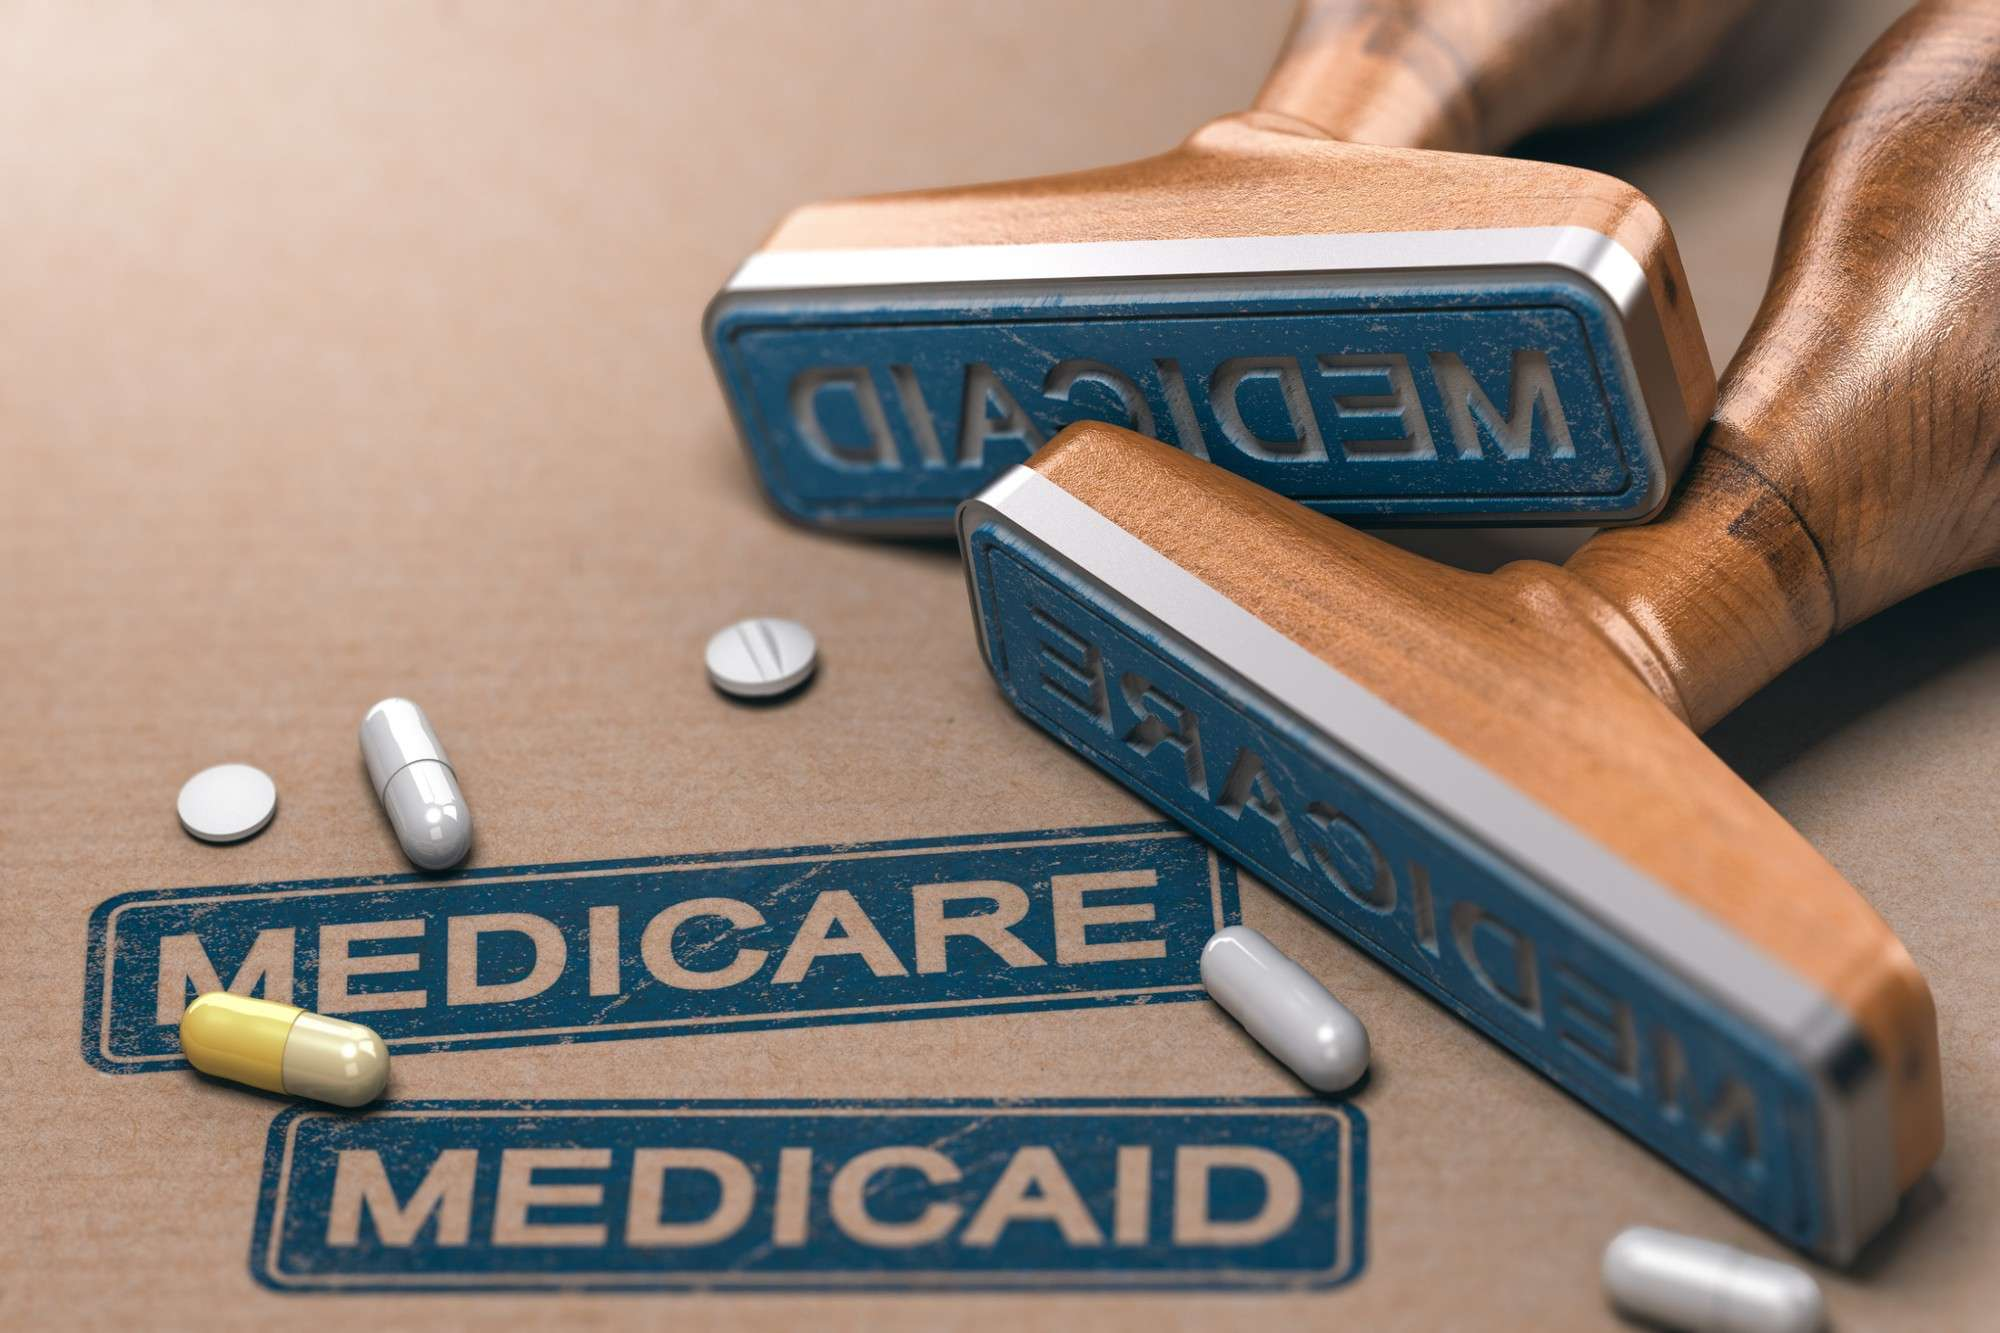 O que é Medicaid e como se diferencia do Medicare? Descubra!